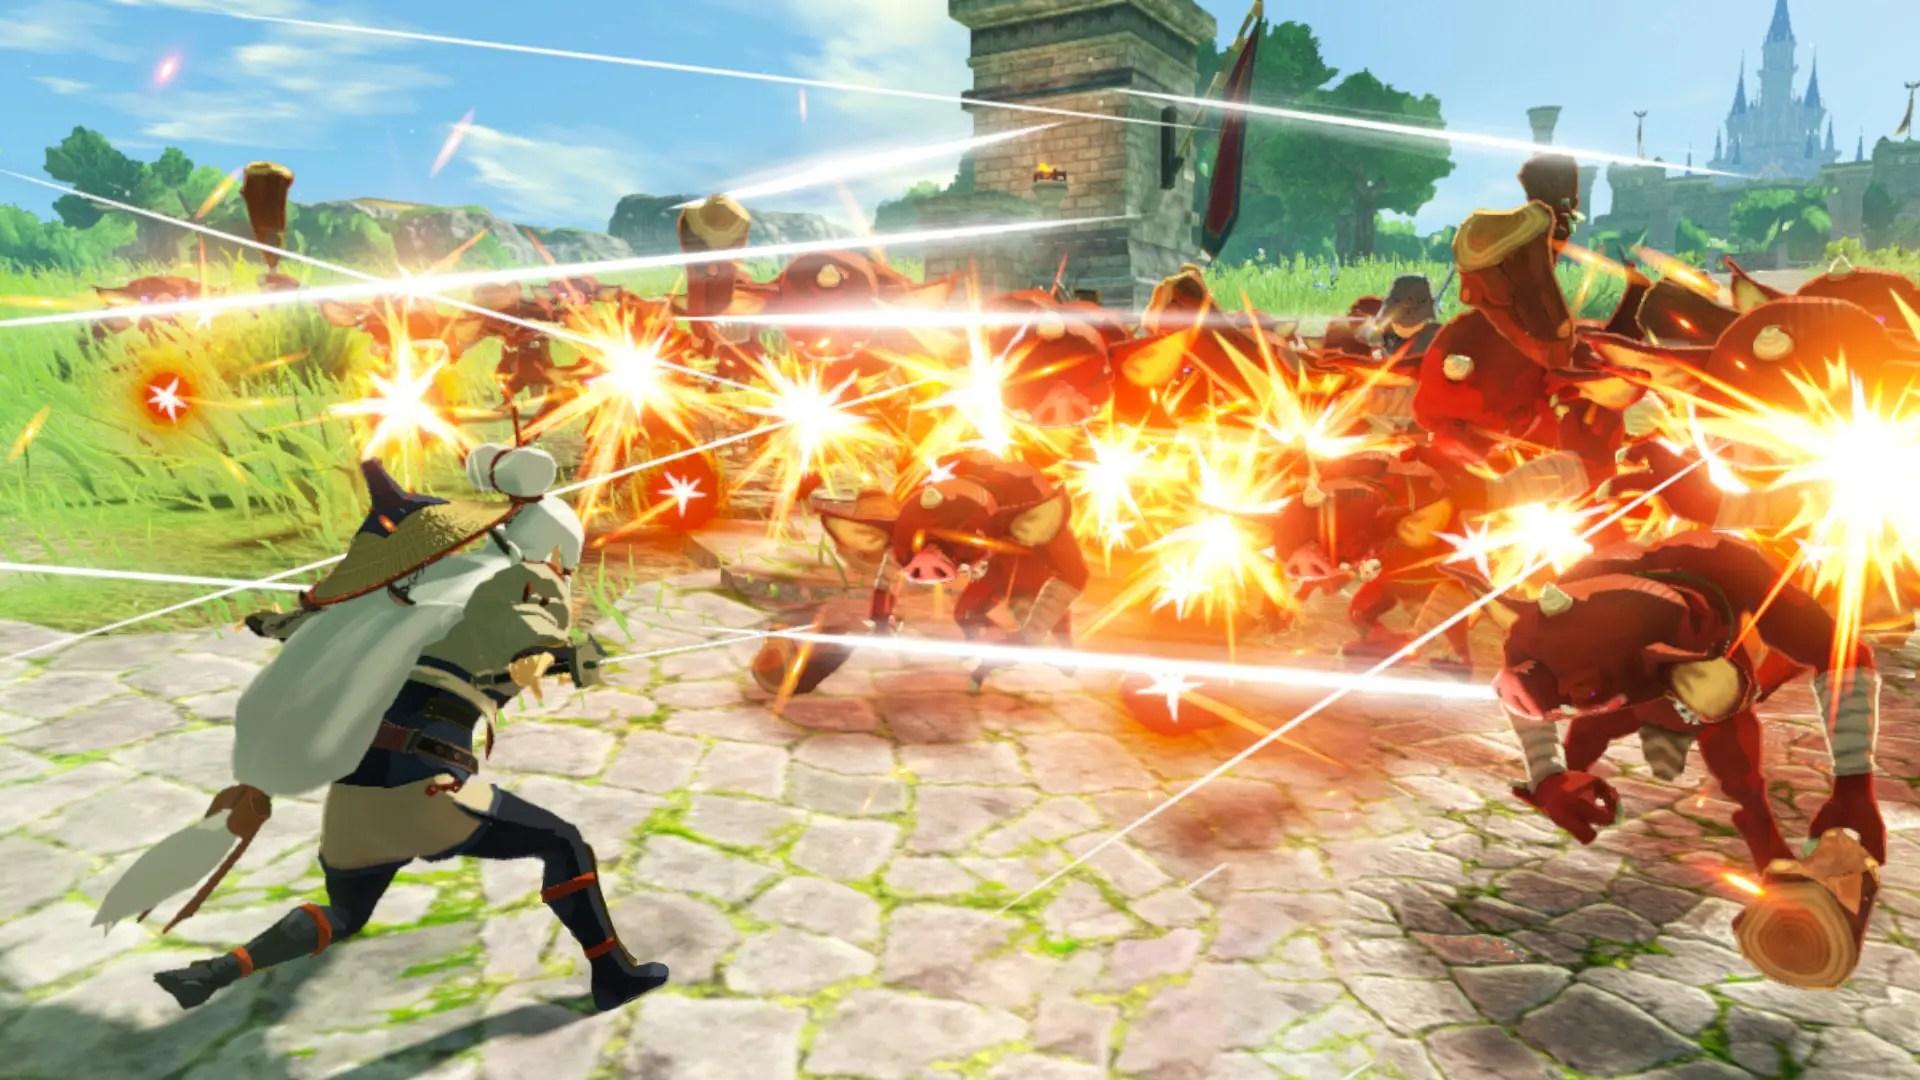 Hyrule Warriors: Age Of Calamity Impa Screenshot 1